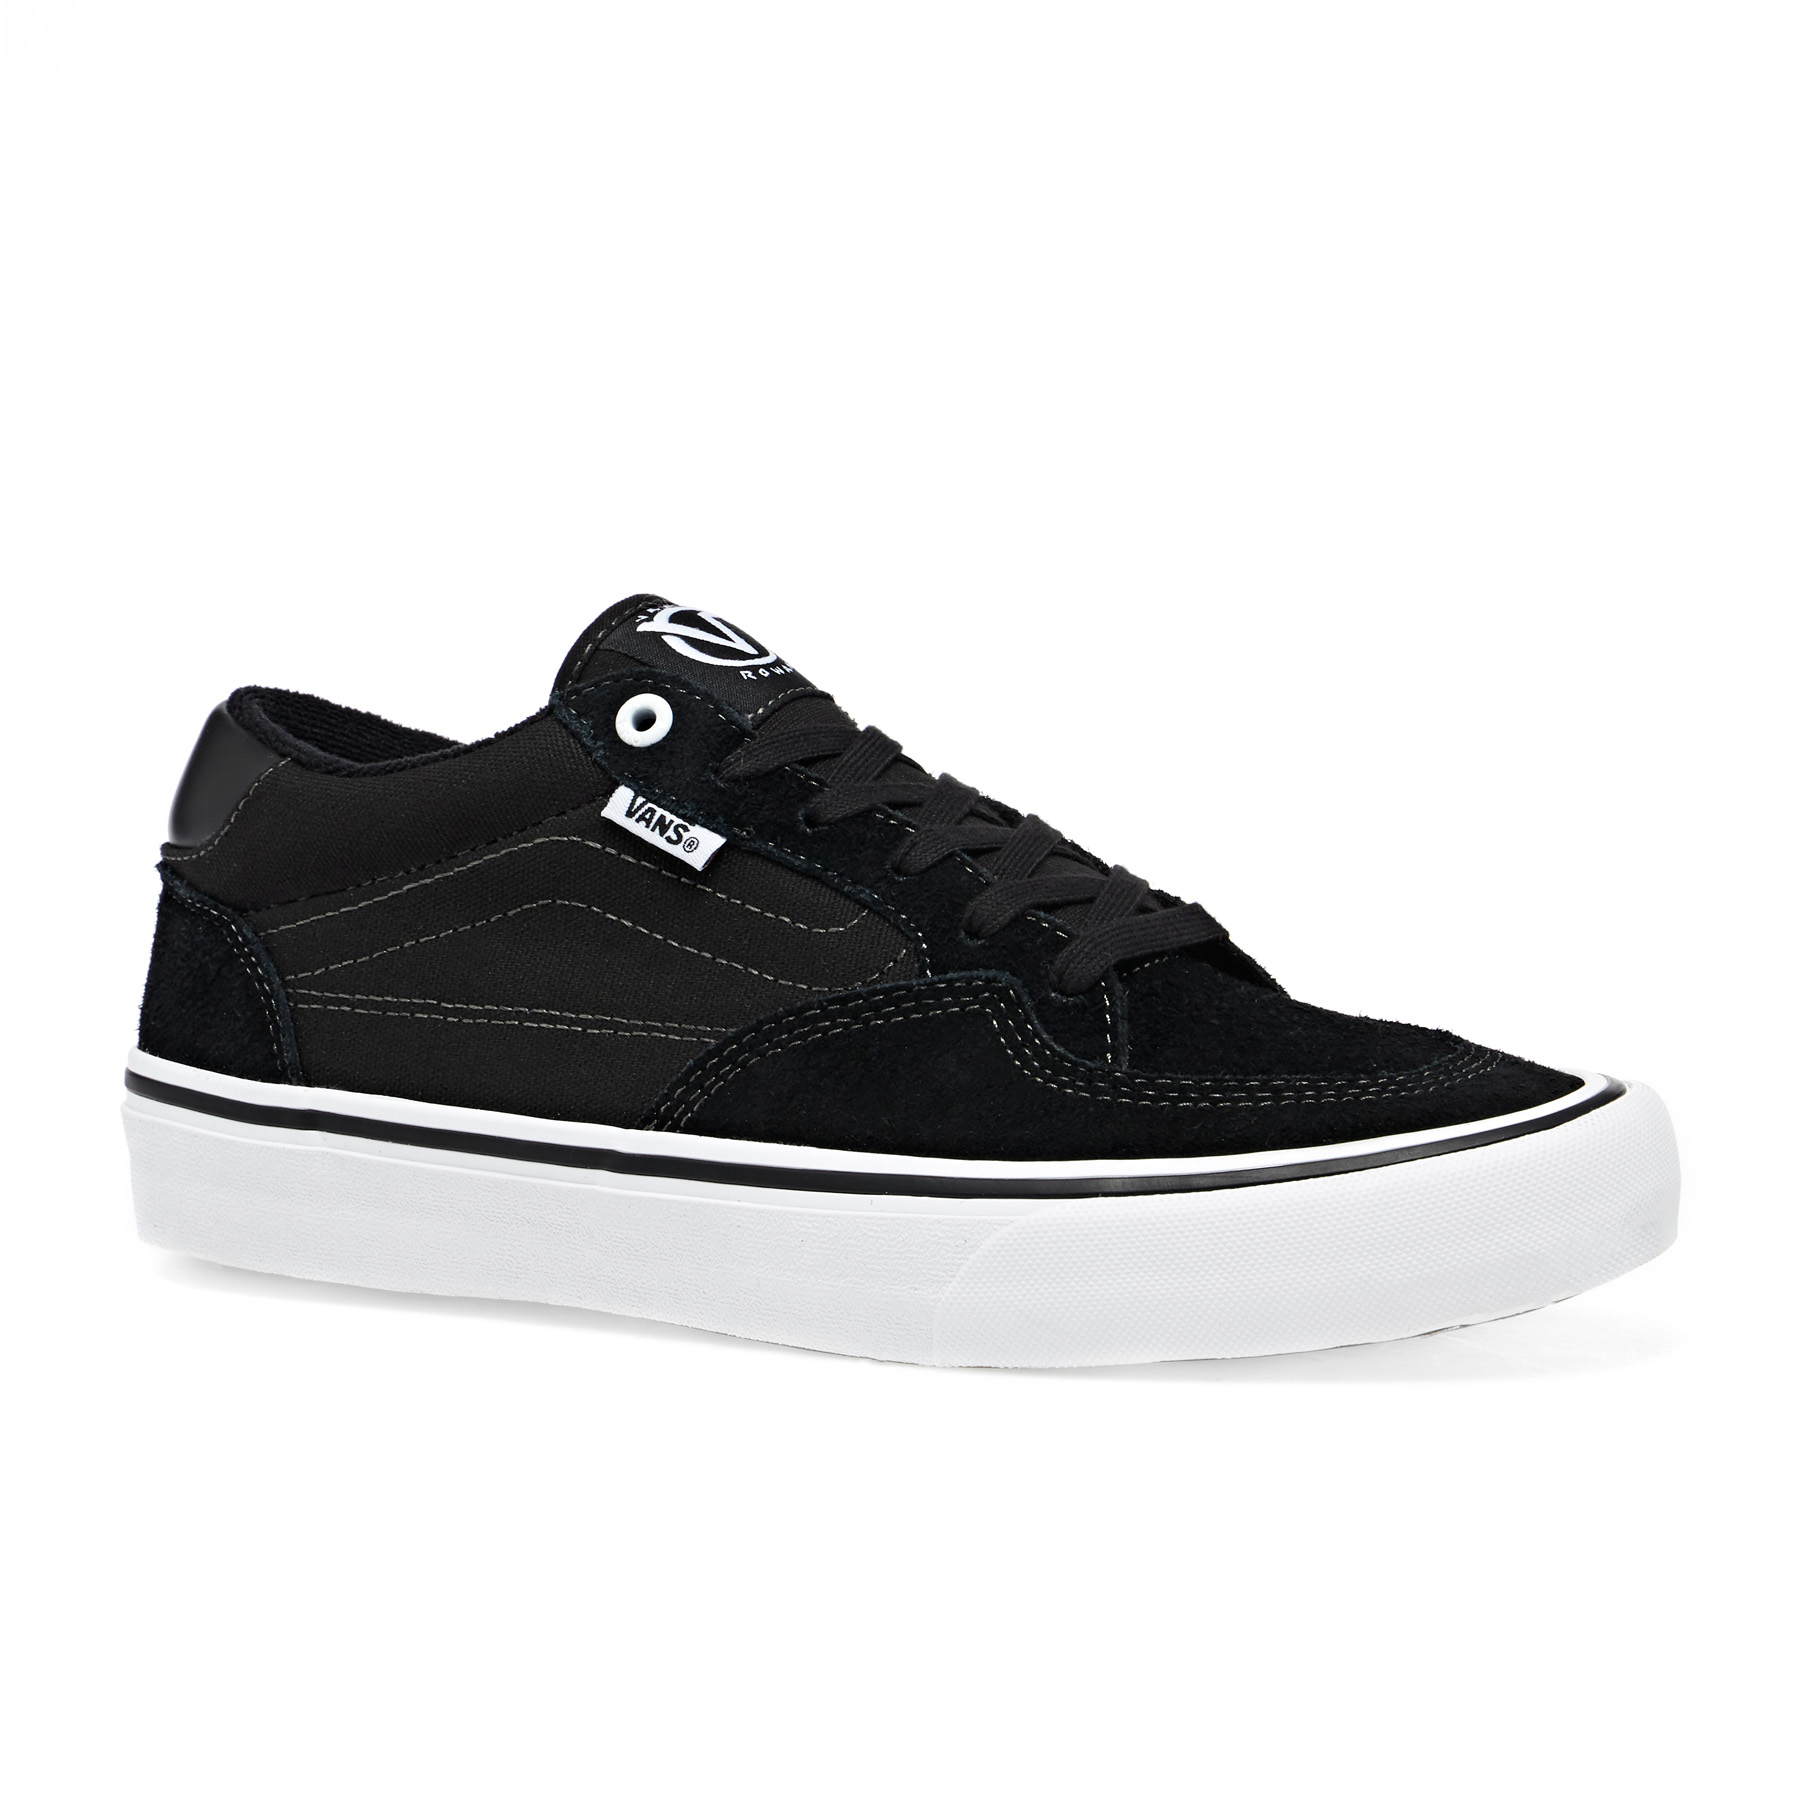 Vans Pro Skate   Shoes & Clothing Surfdome Australia